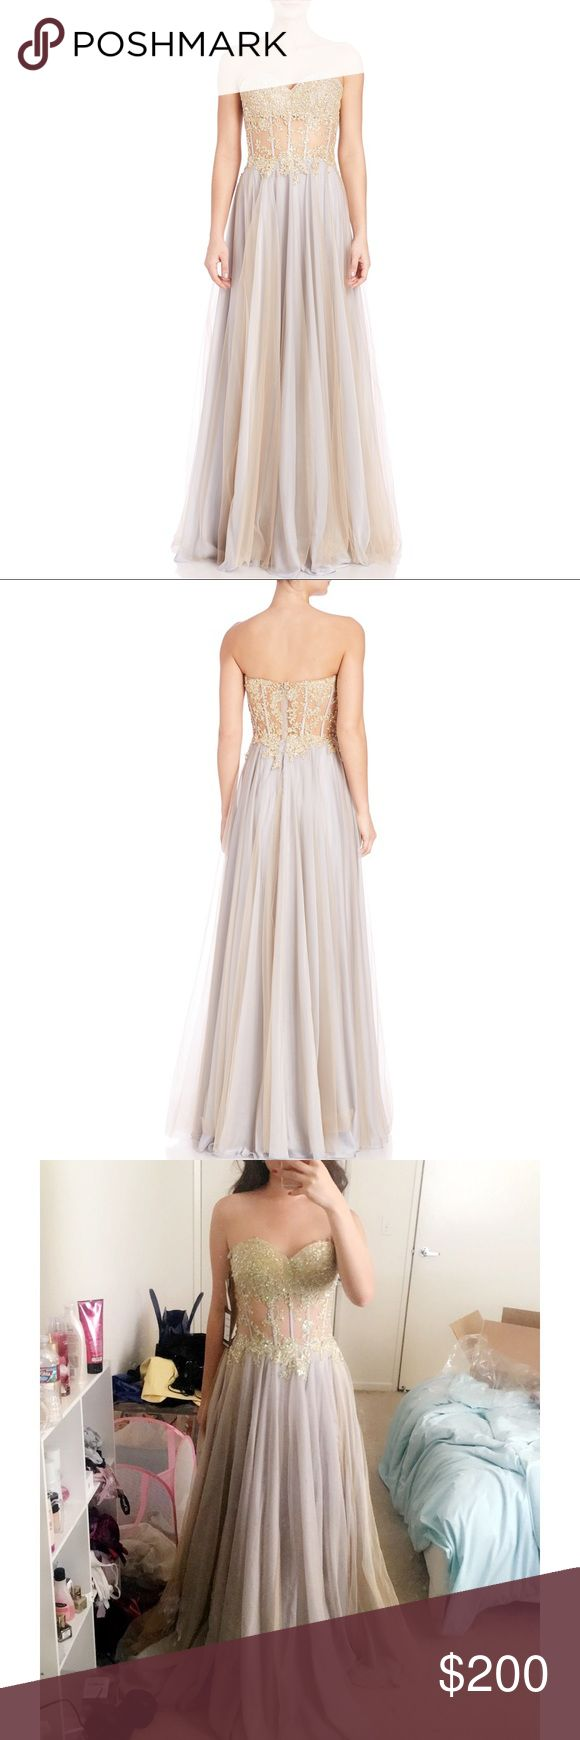 La Femme Prom Dress (size 0) La femme tulle corset bodice gown. Only worn once! La Femme Dresses Prom